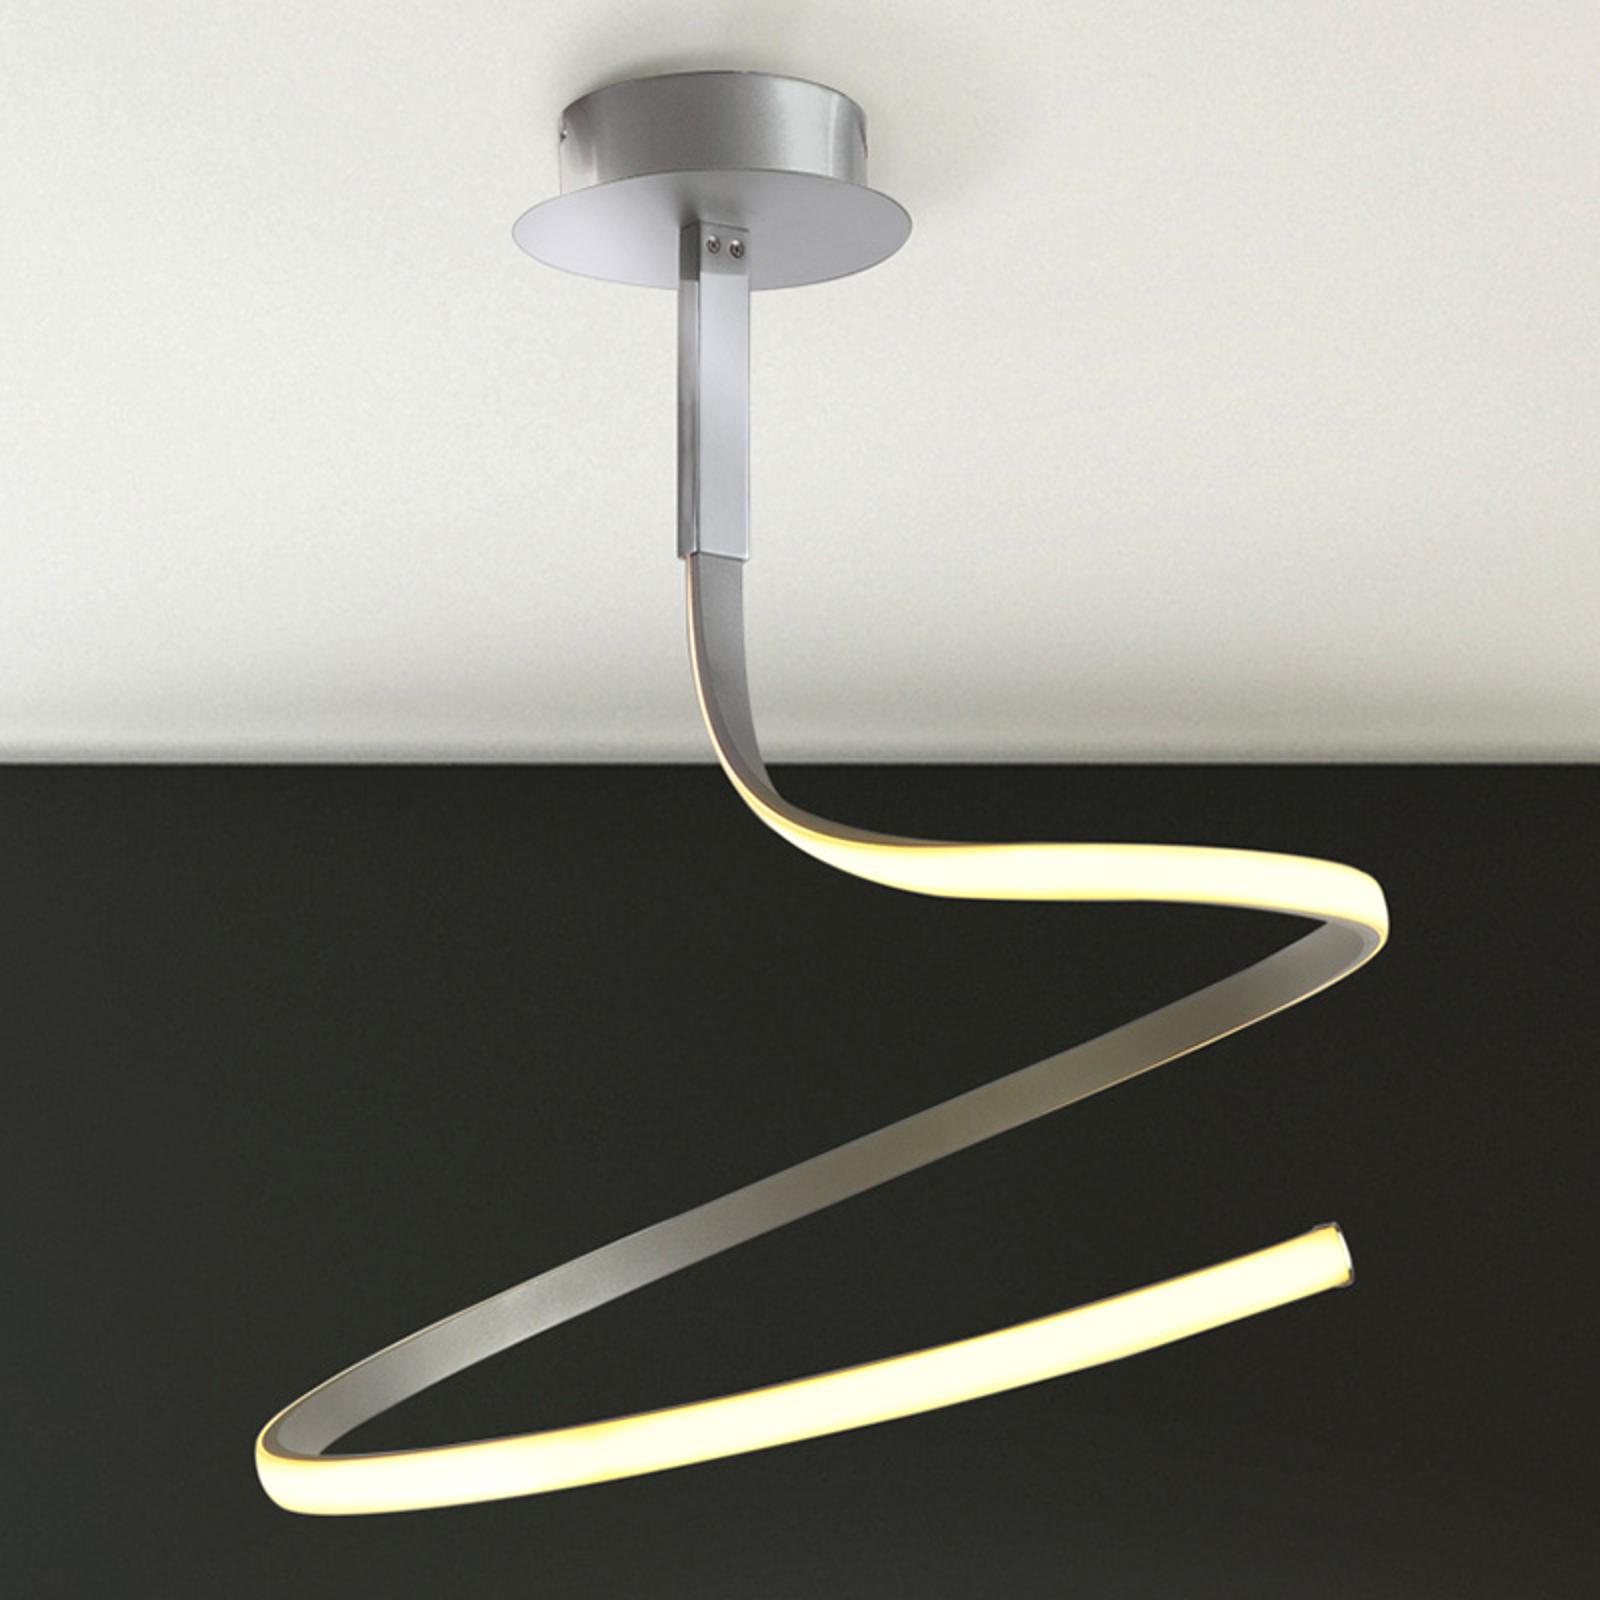 LED hanglamp Nur 30 W